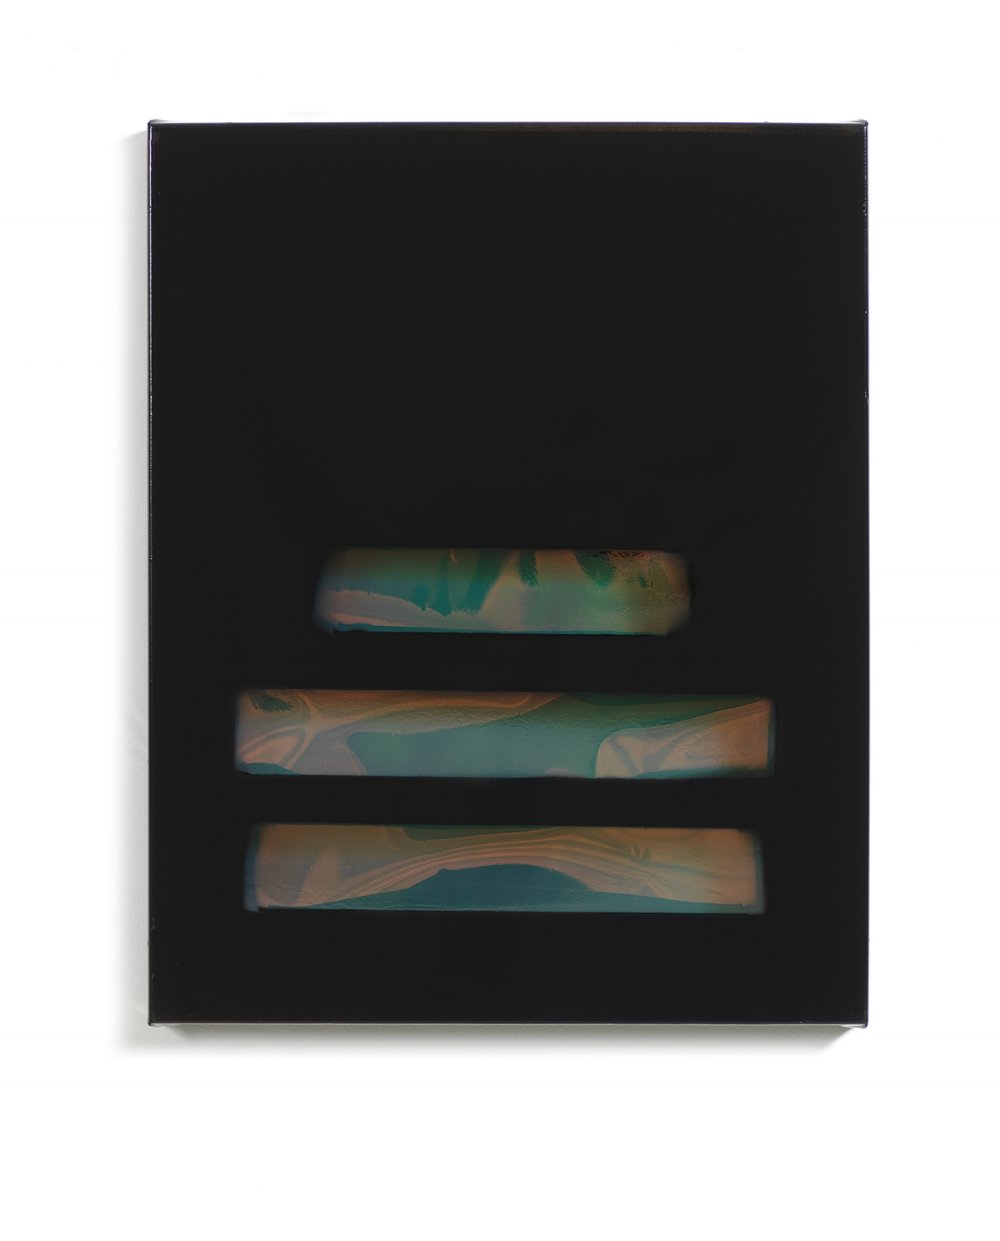 Free Room (Ravyn Lenae)    Spray paint, iridescent film, vinyl 20 x 16 in